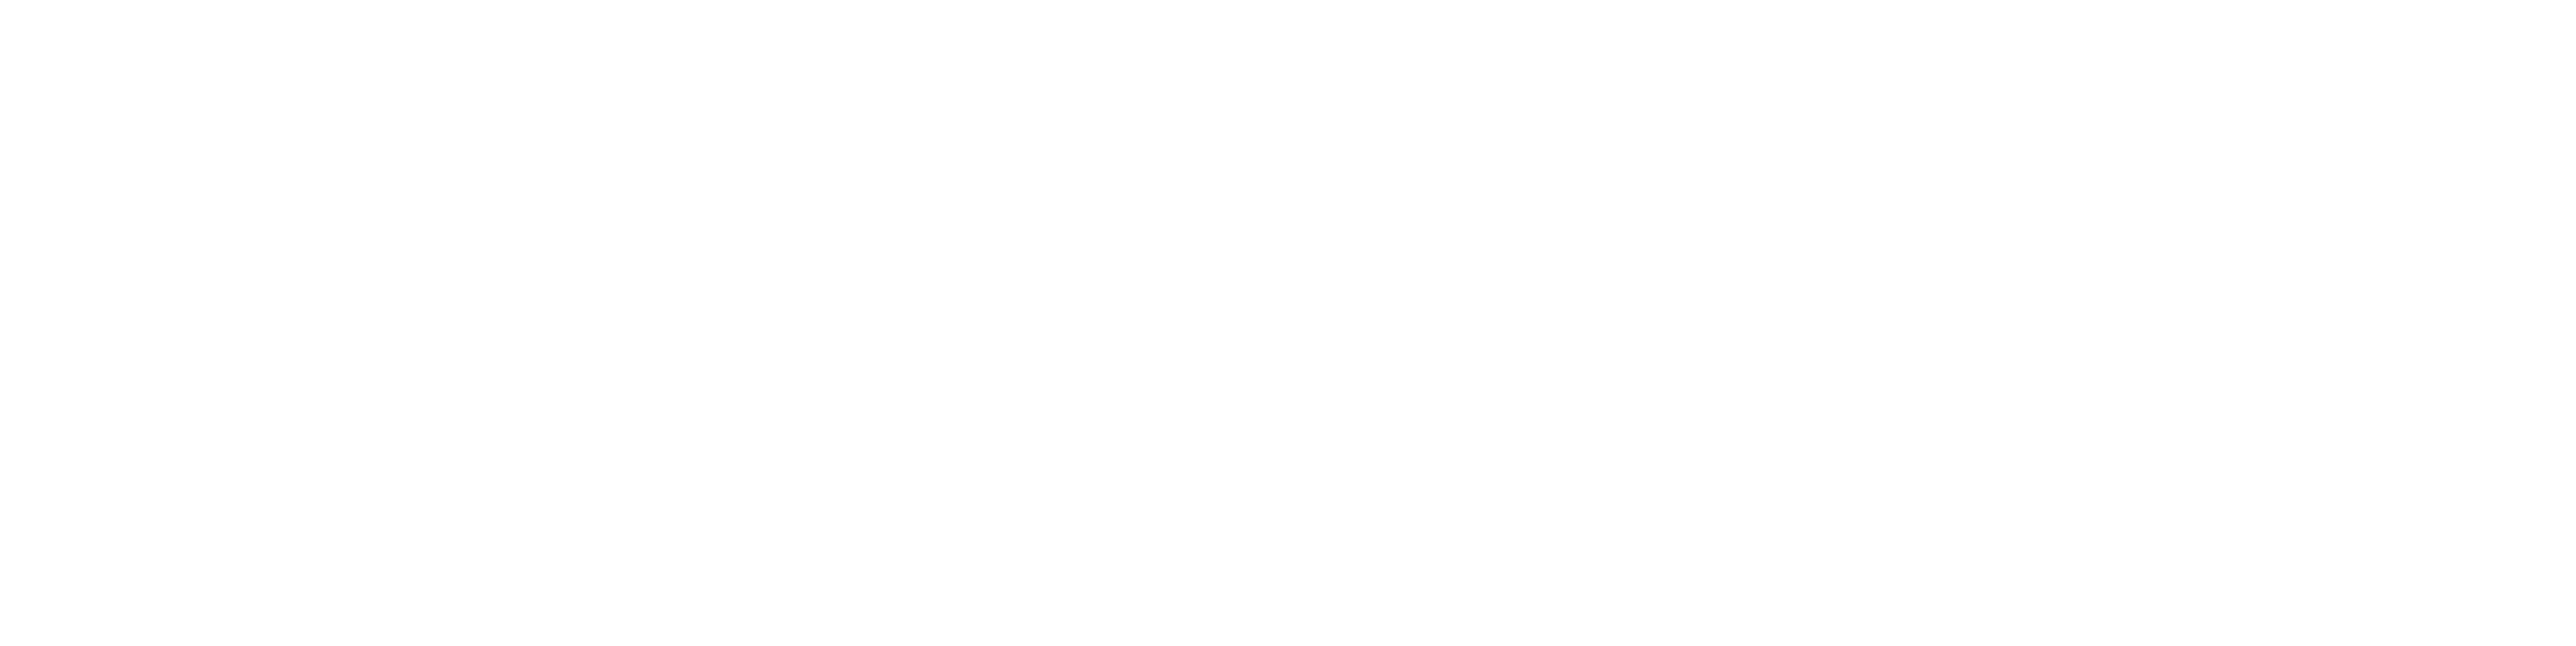 STR8FWD